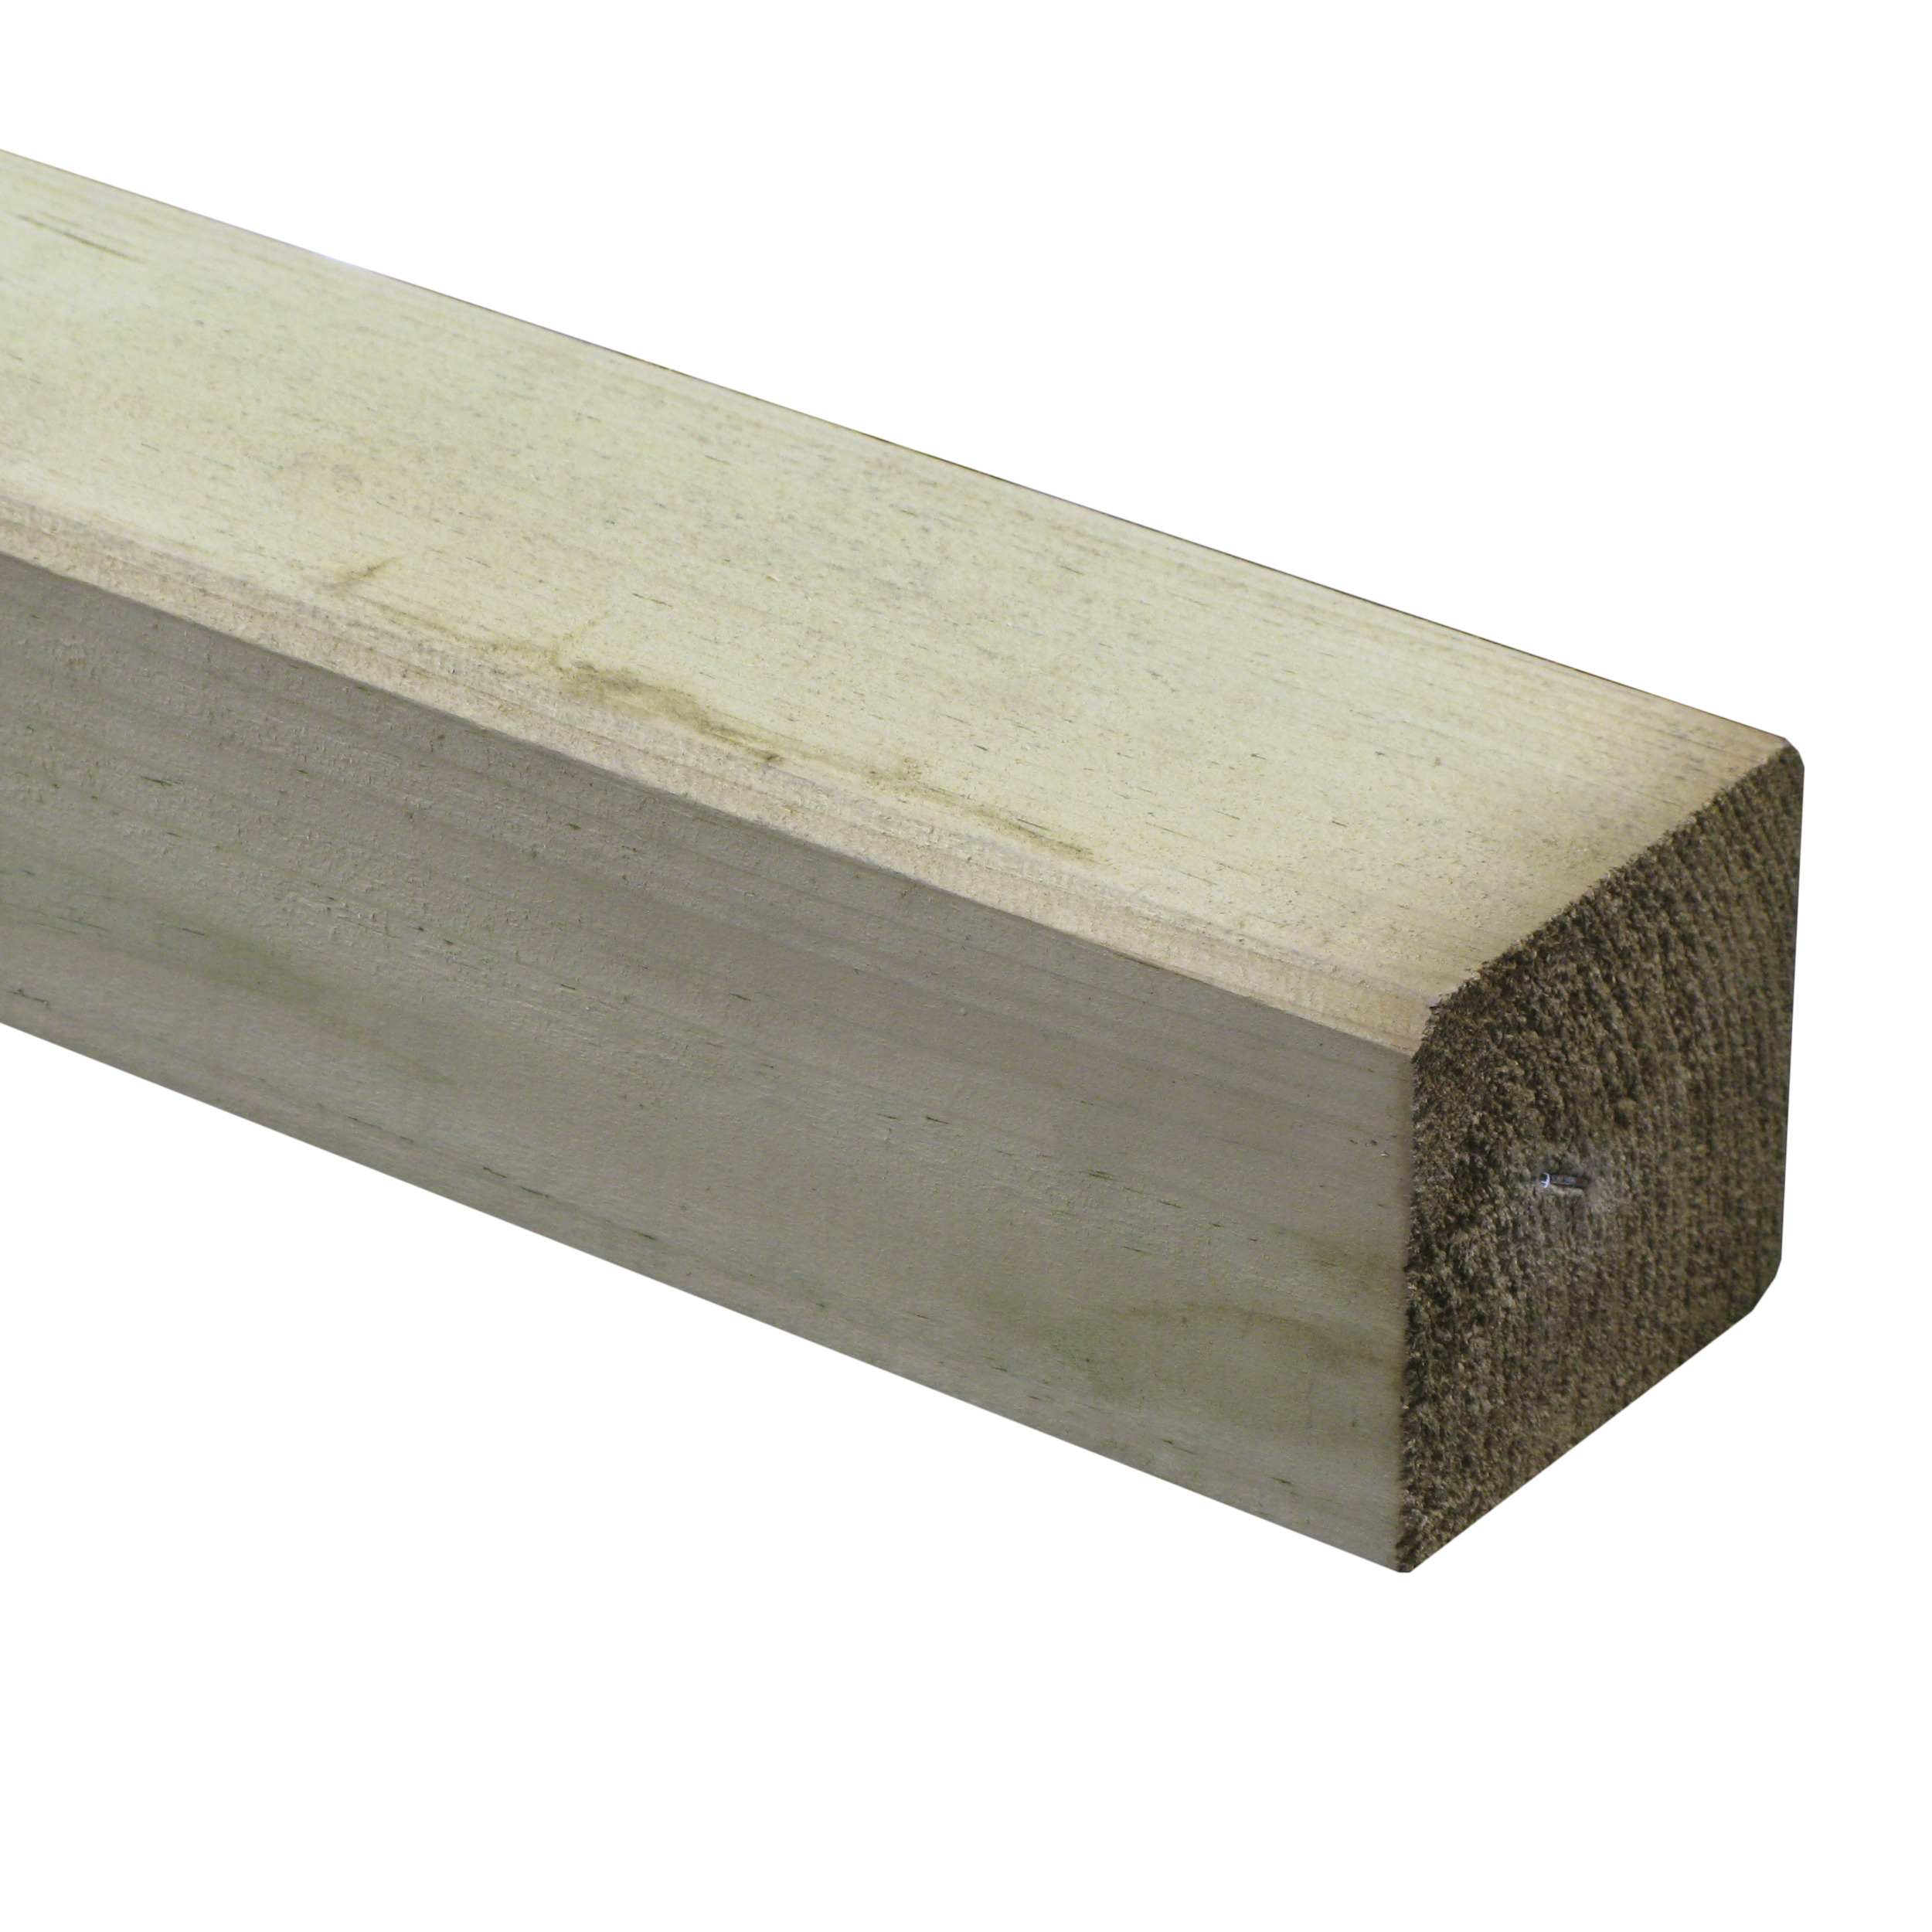 Tuinpaal geimpregneerd 8,8x8,8 cm, lengte 180 cm